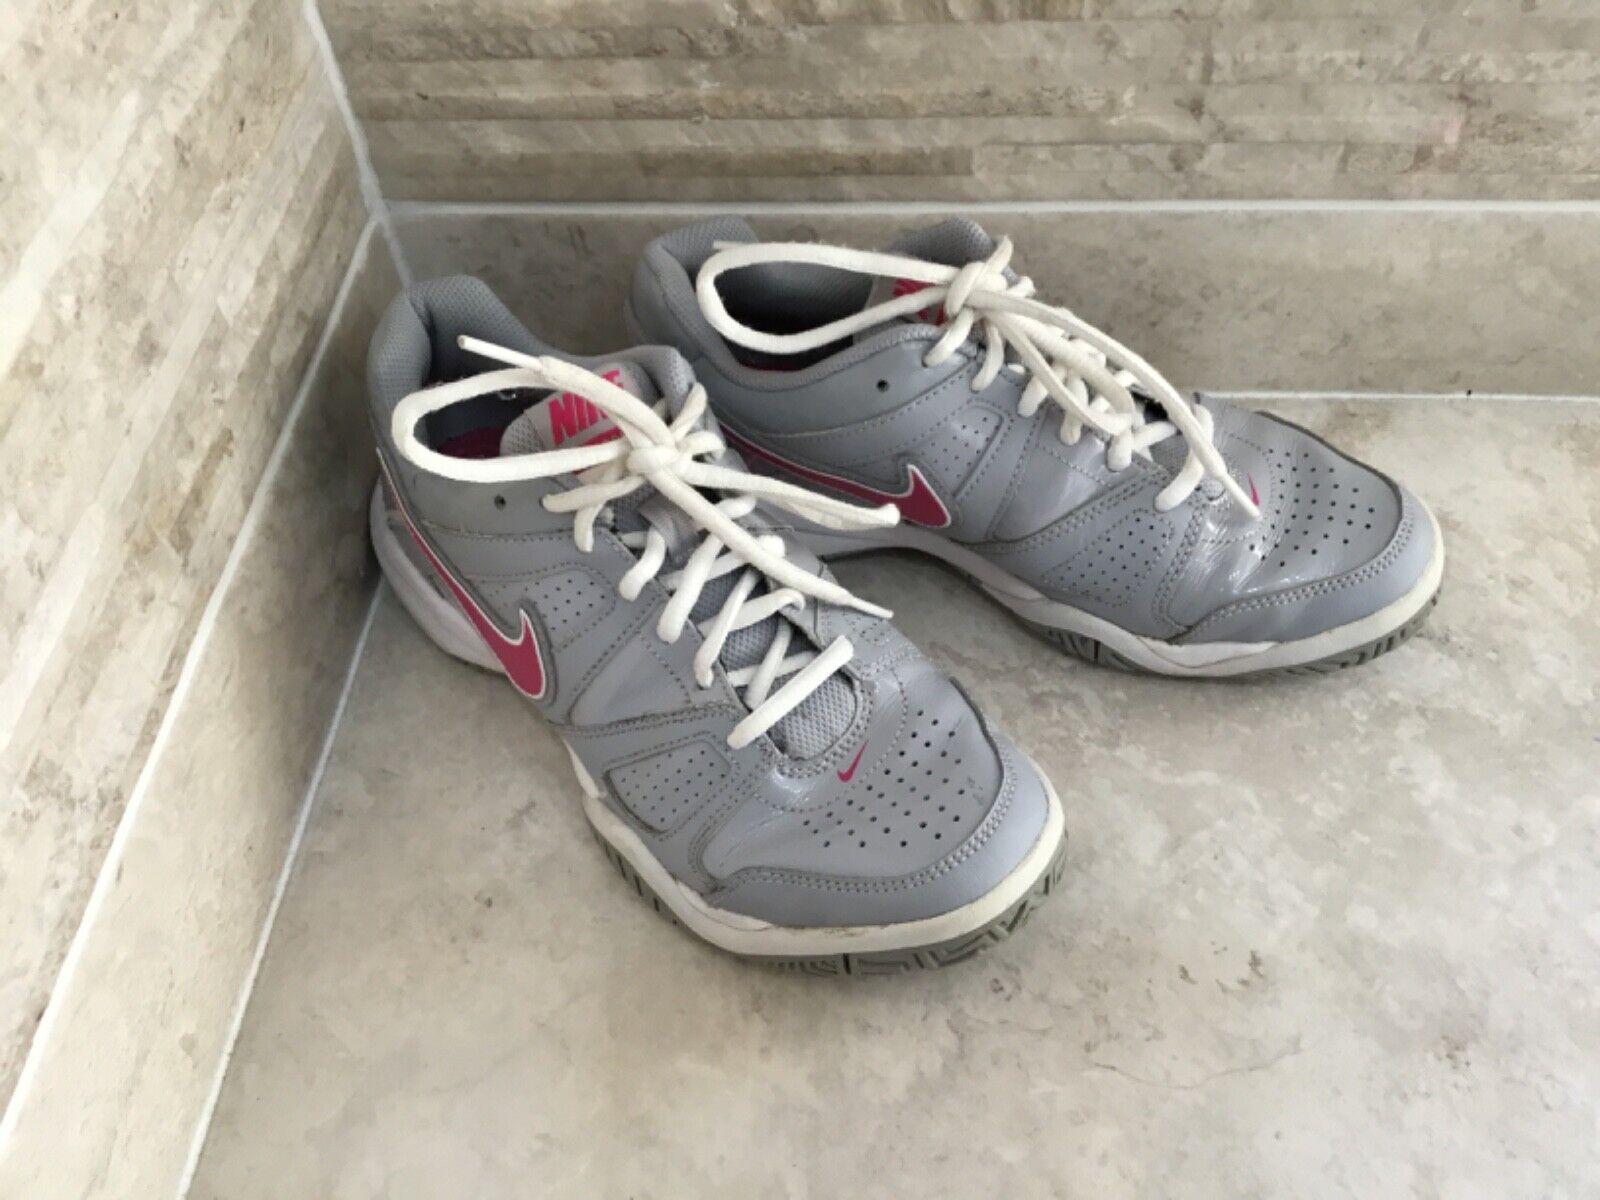 Nike City Court 7 Baskets Vernies Gris & Rose UK 4 Chaussures de Tennis *